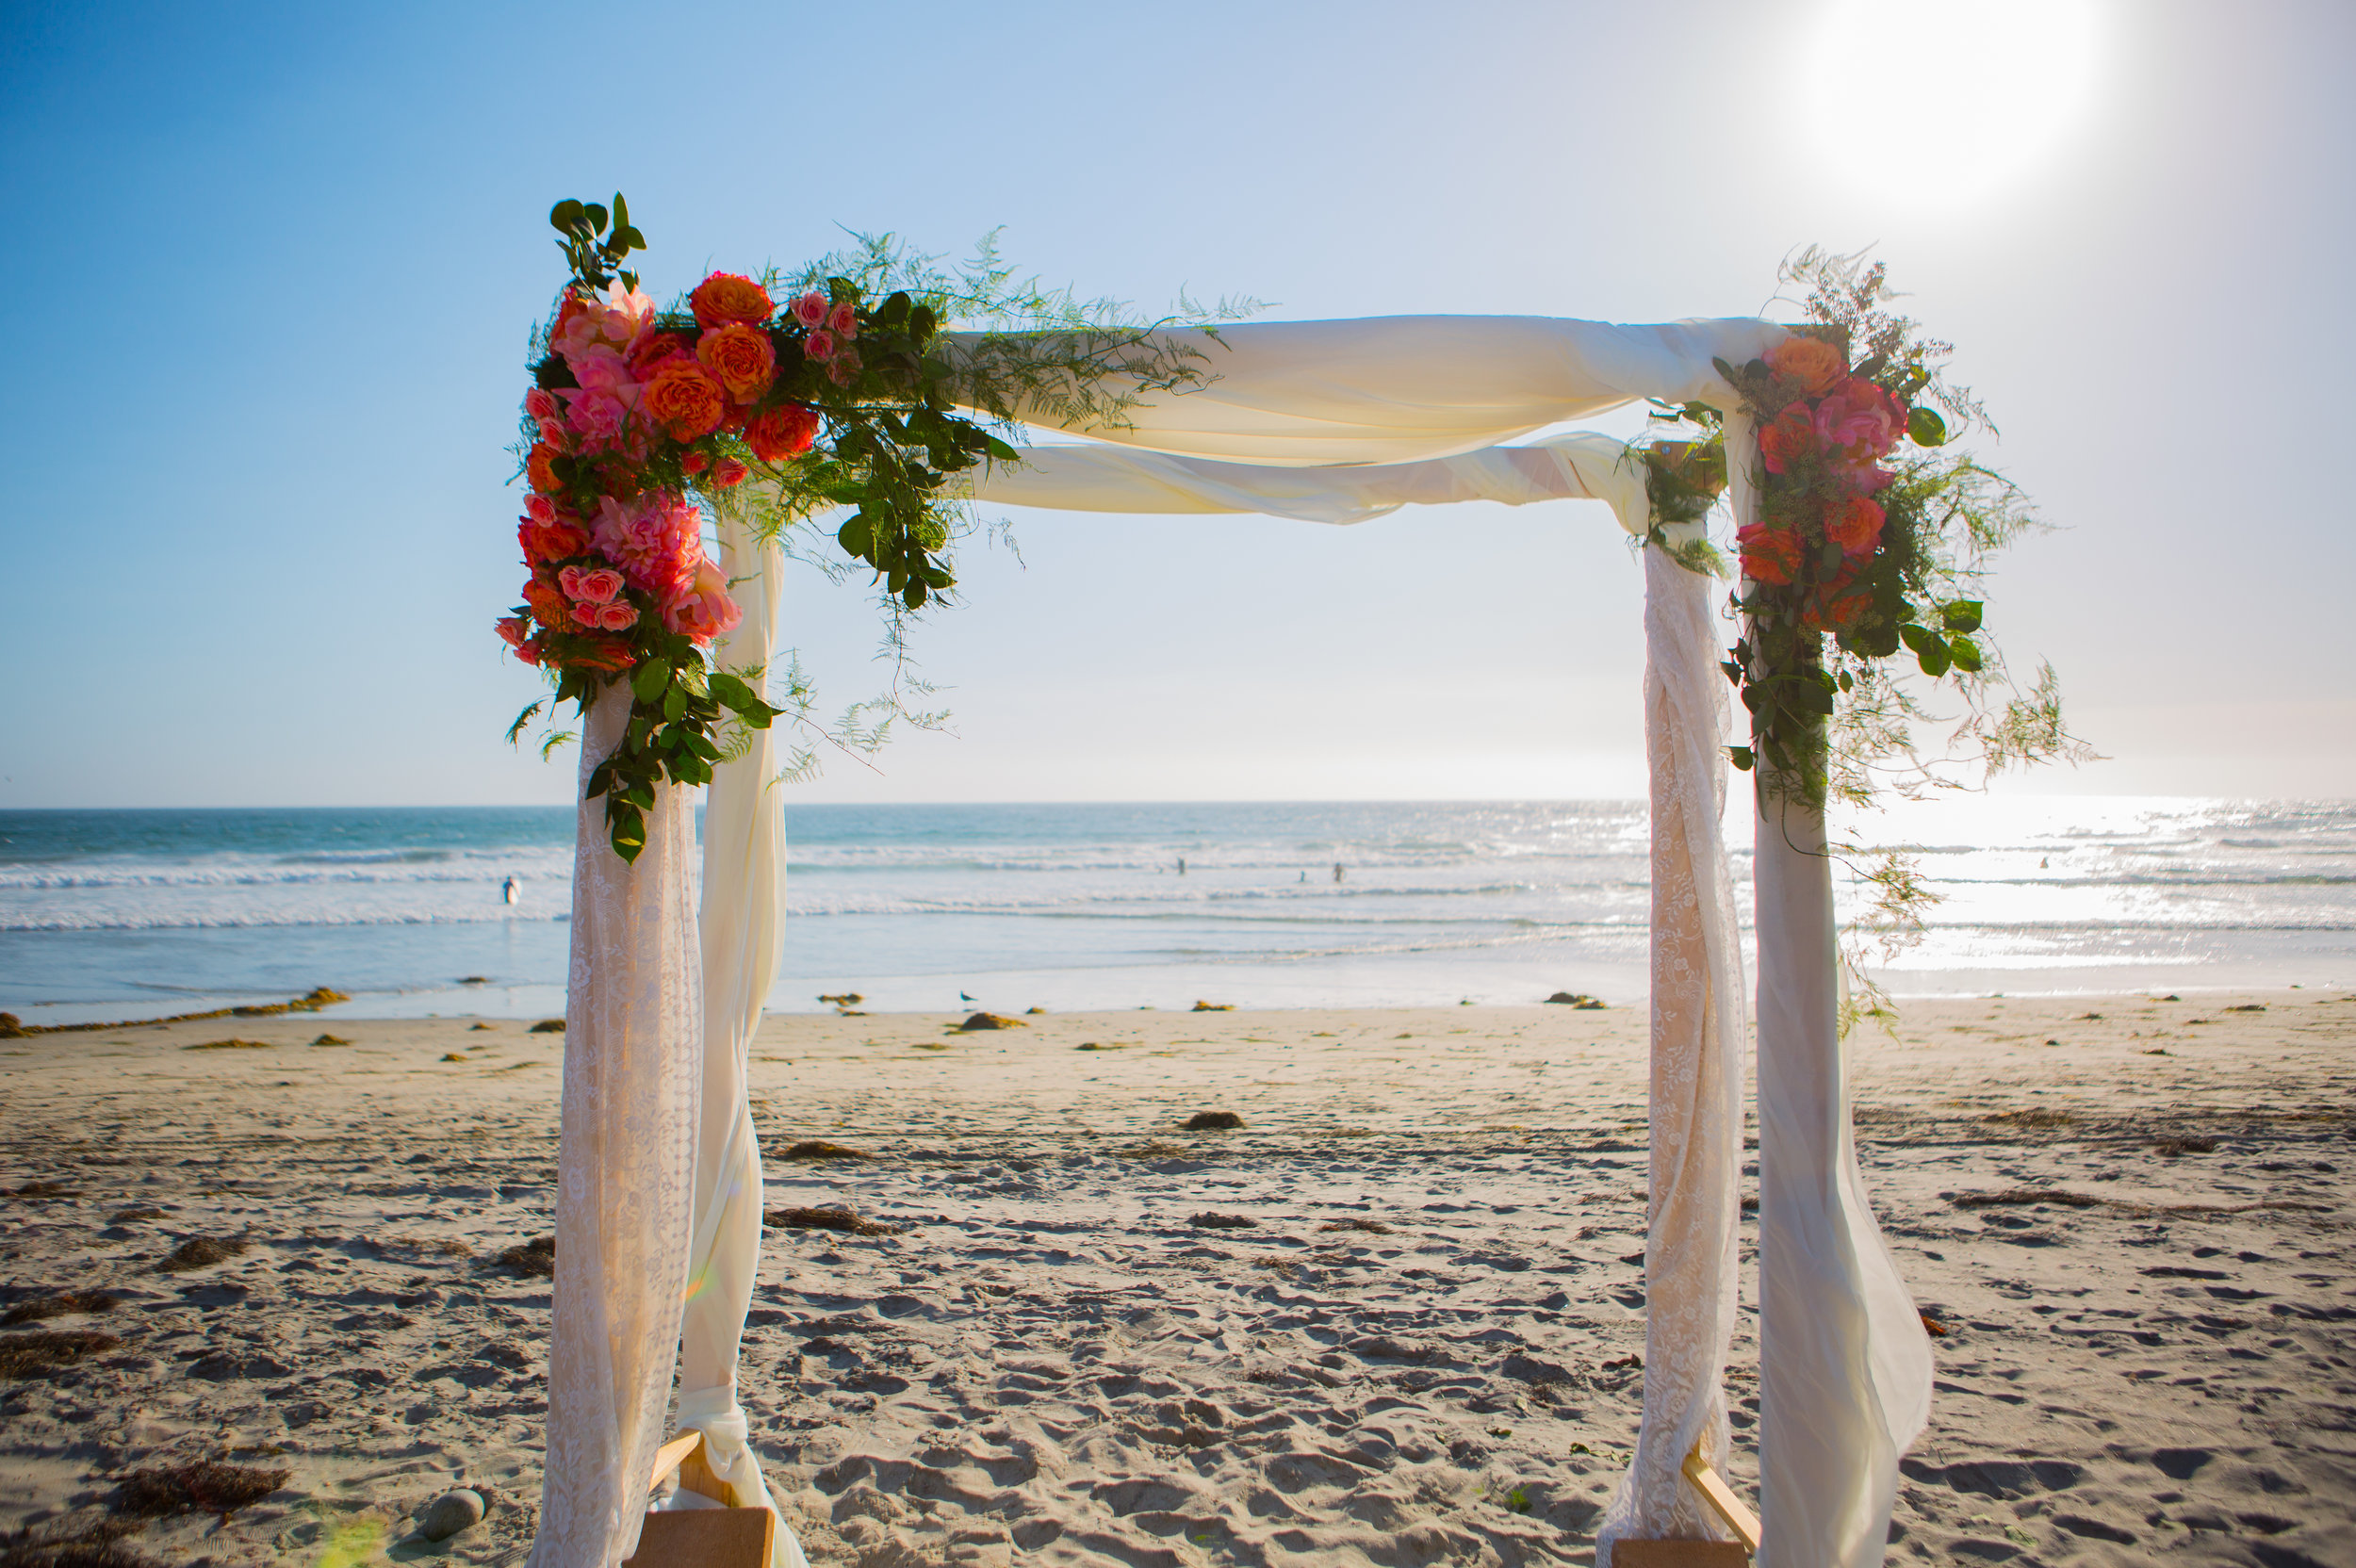 Pacific-Coast-Grill-Beach-Wedding-Olivia-Kevin-2016-238.jpg